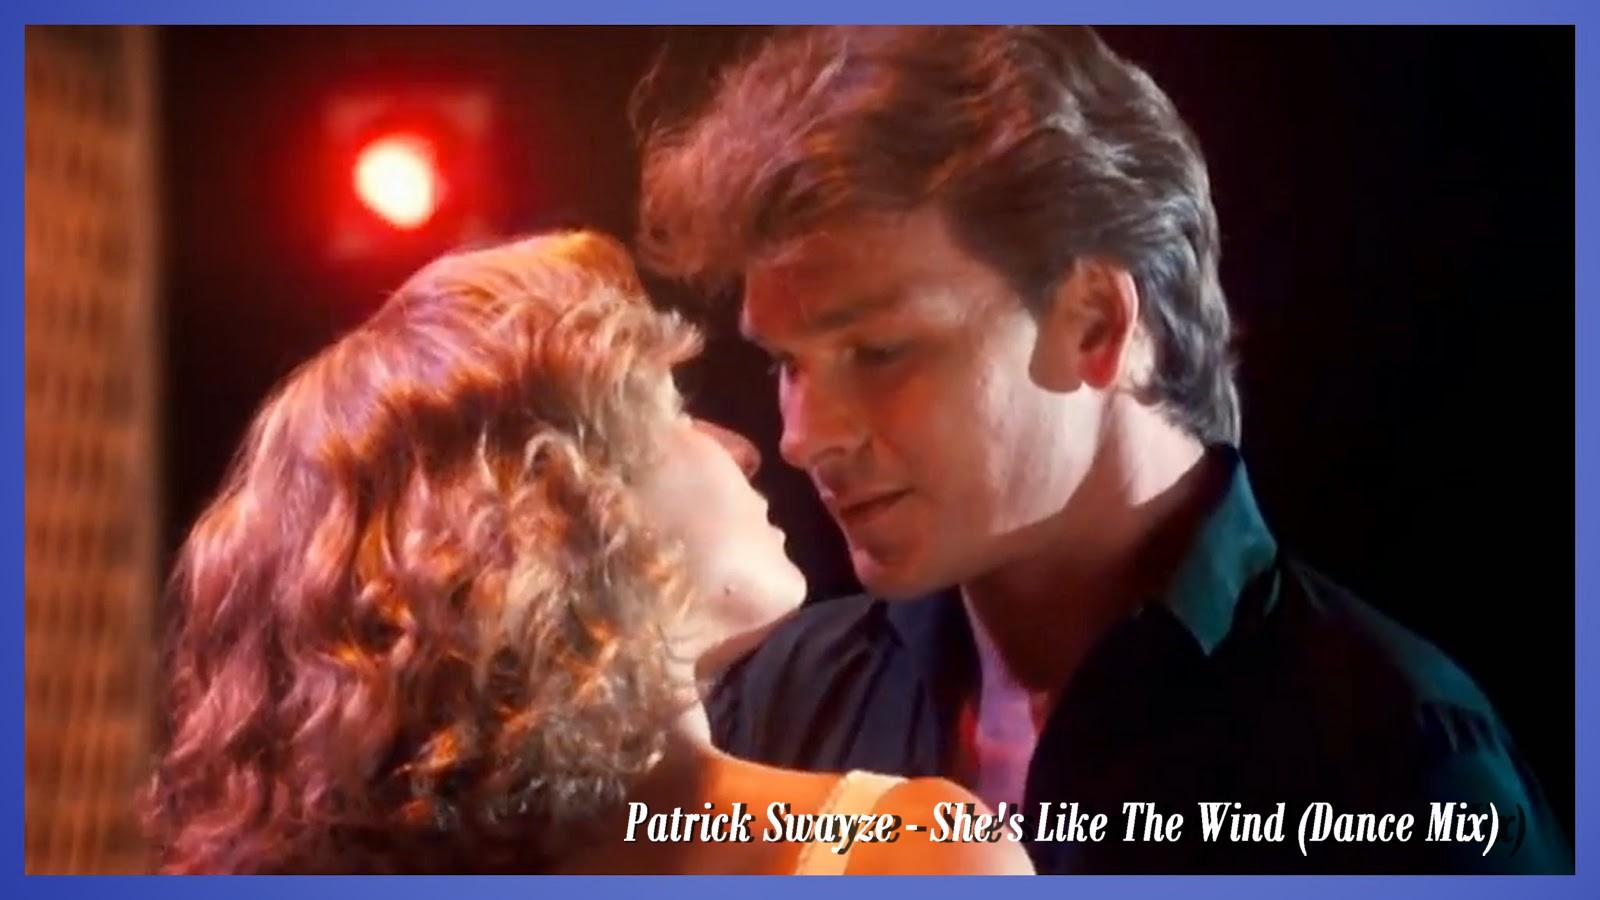 RETRO DISCO HI-NRG: Patrick Swayze - She's Like The Wind ...